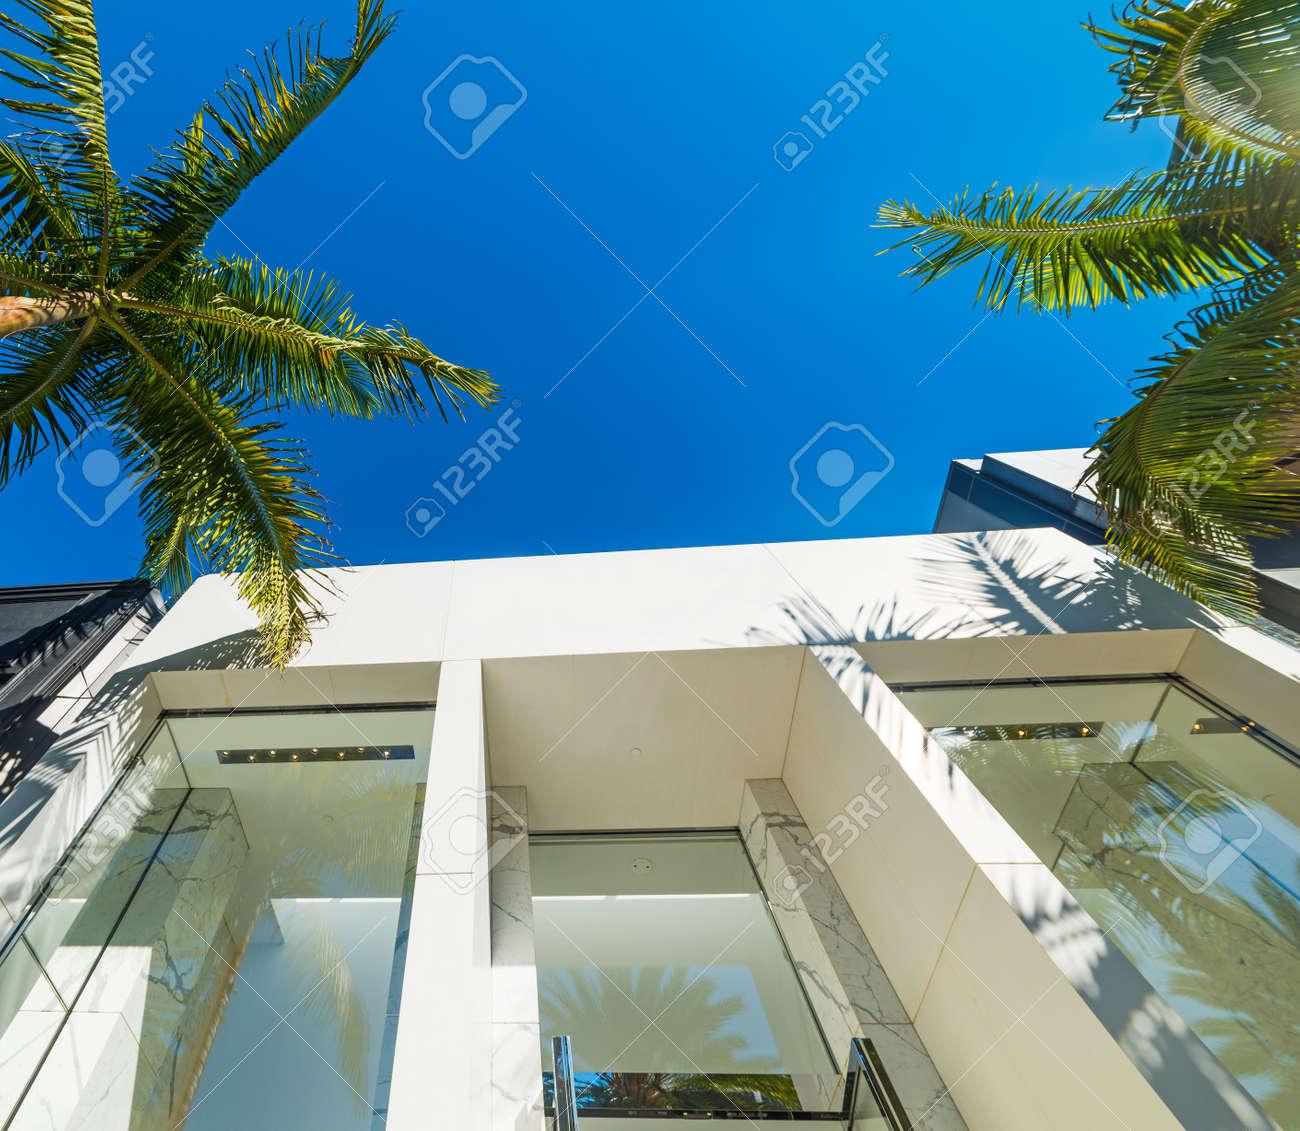 Elegant buildings in Beverly Hills, California - 75213885